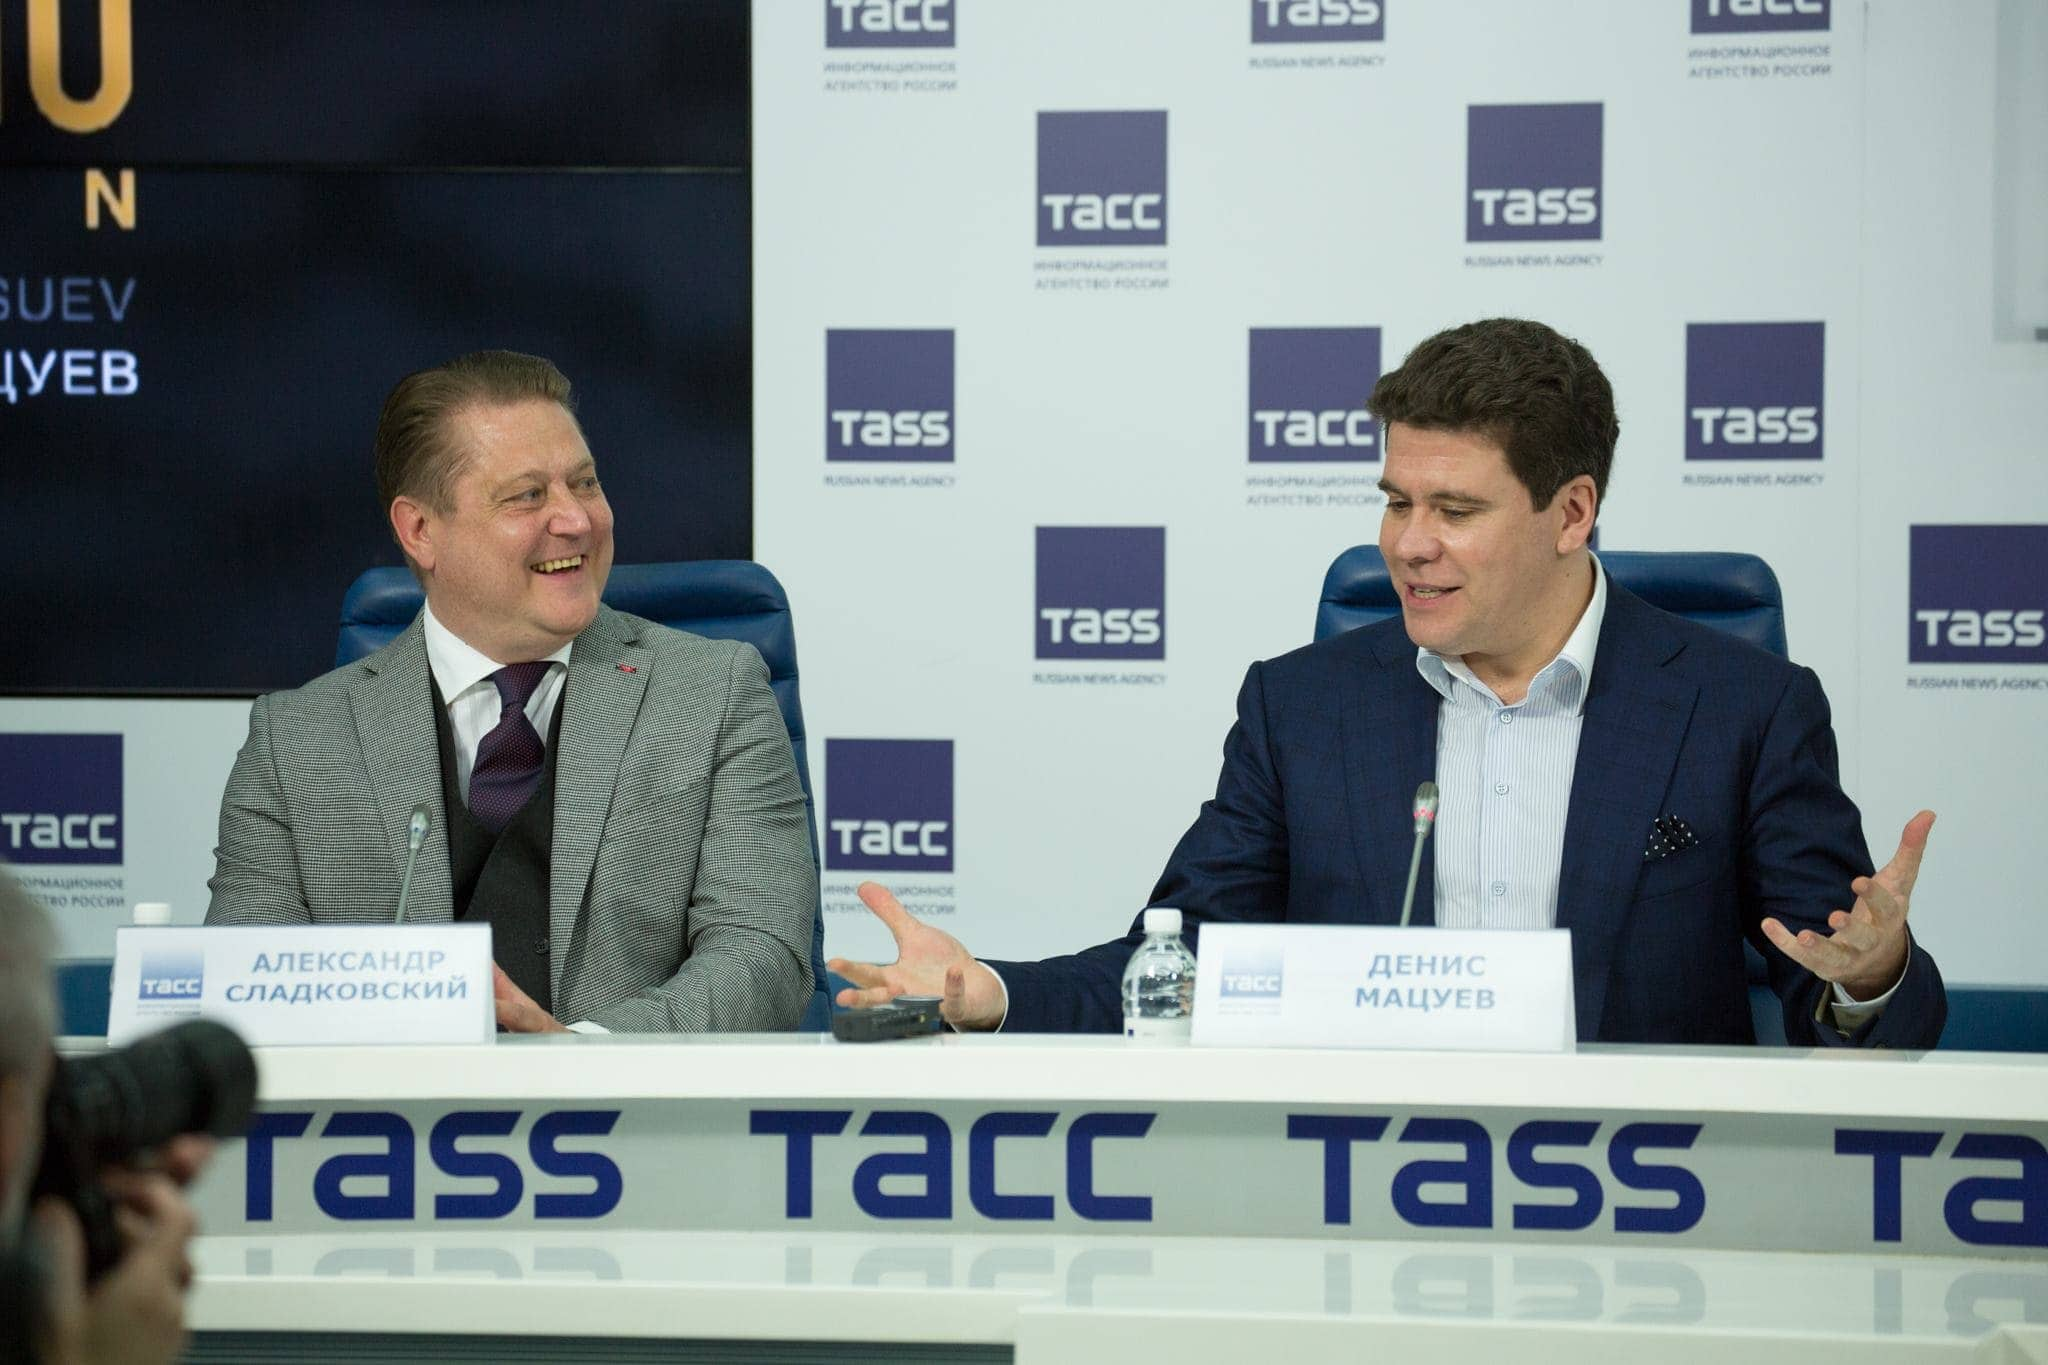 Александр Сладковский и Денис Мацуев